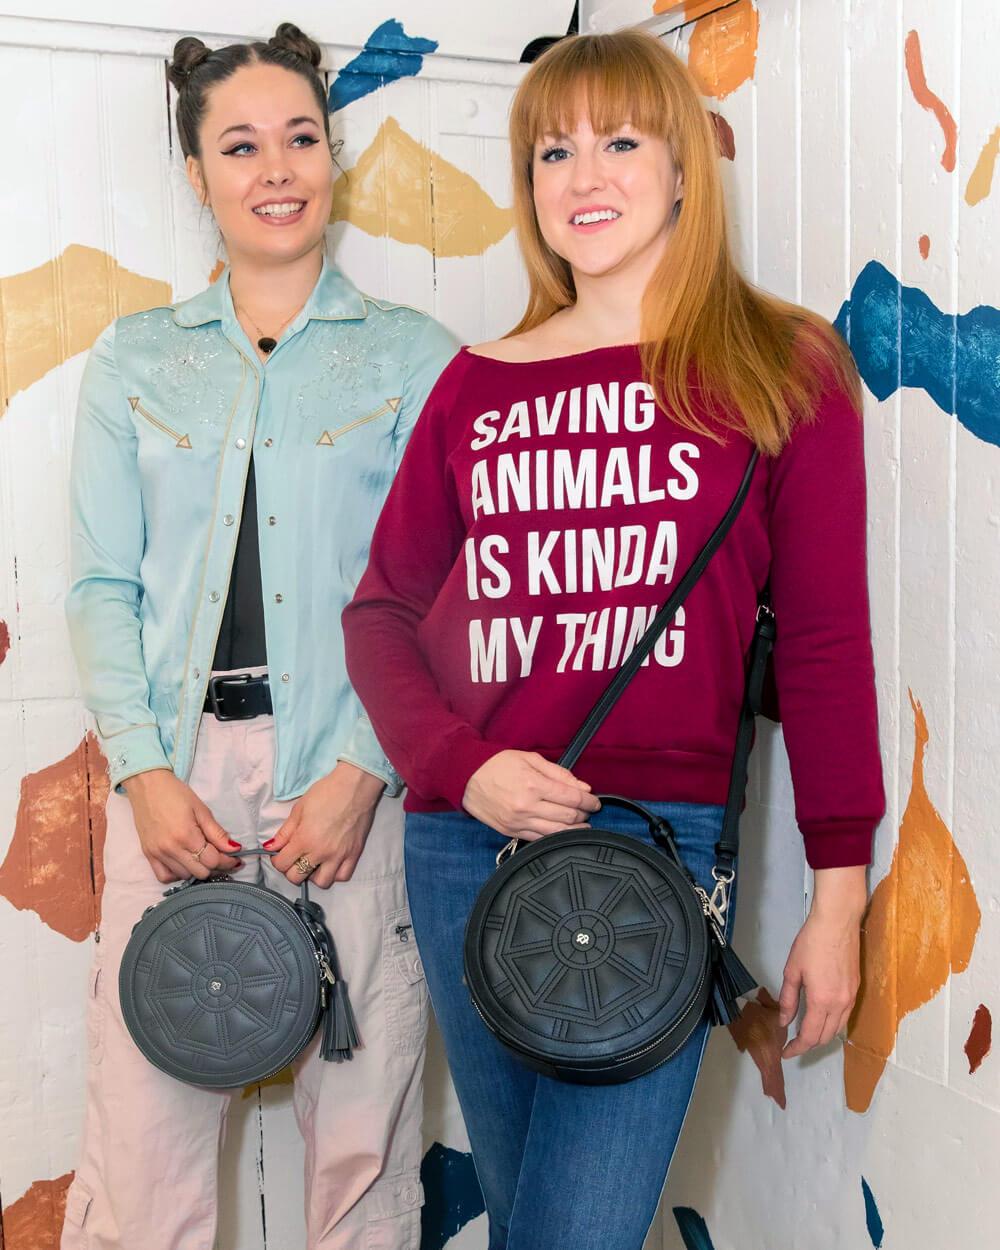 Gunas vegan leather handbags